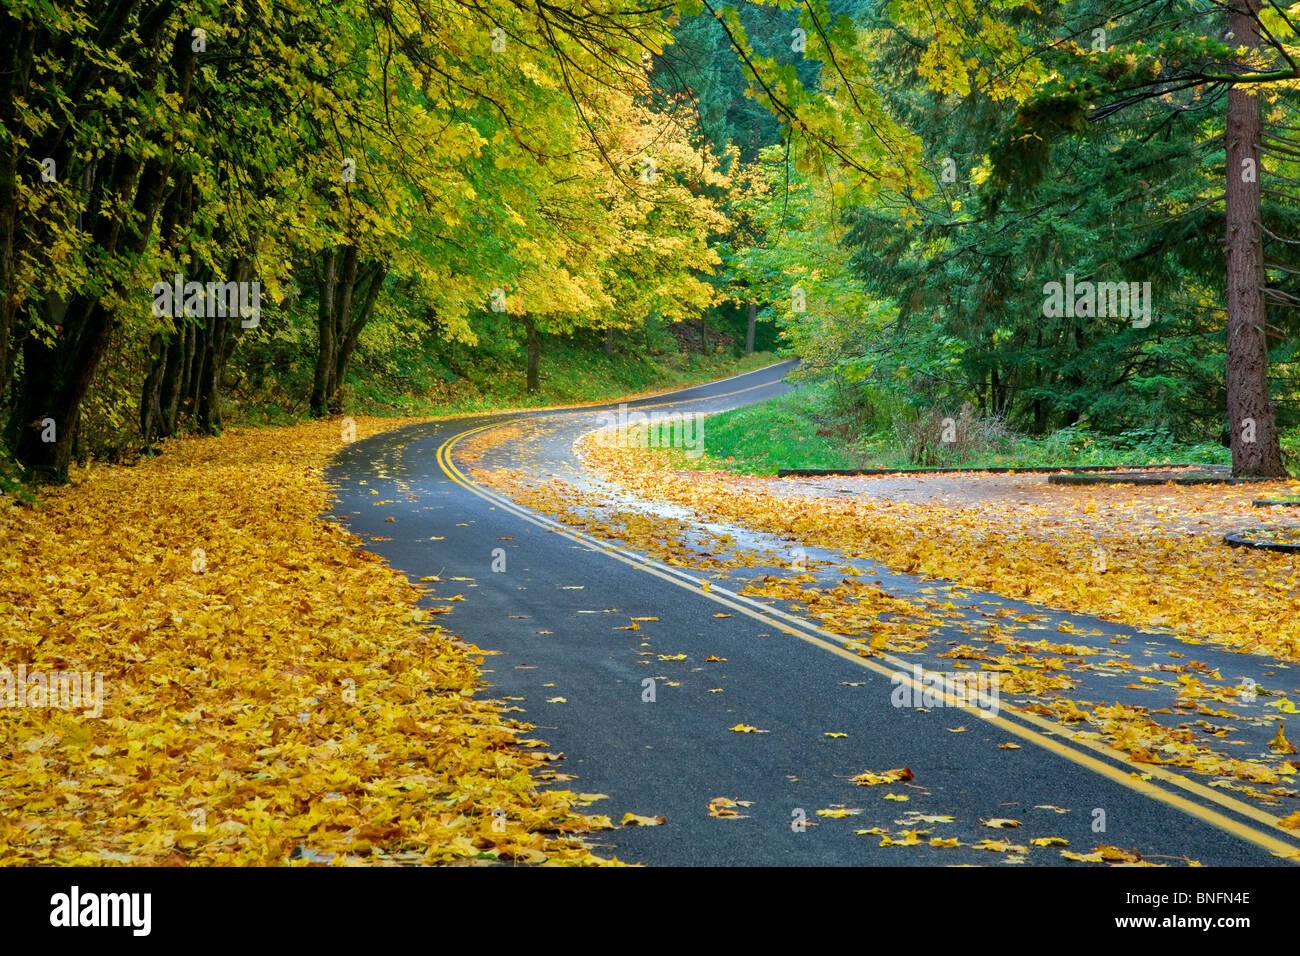 Columbia River Gorge National Scenic Area road. Oregon - Stock Image